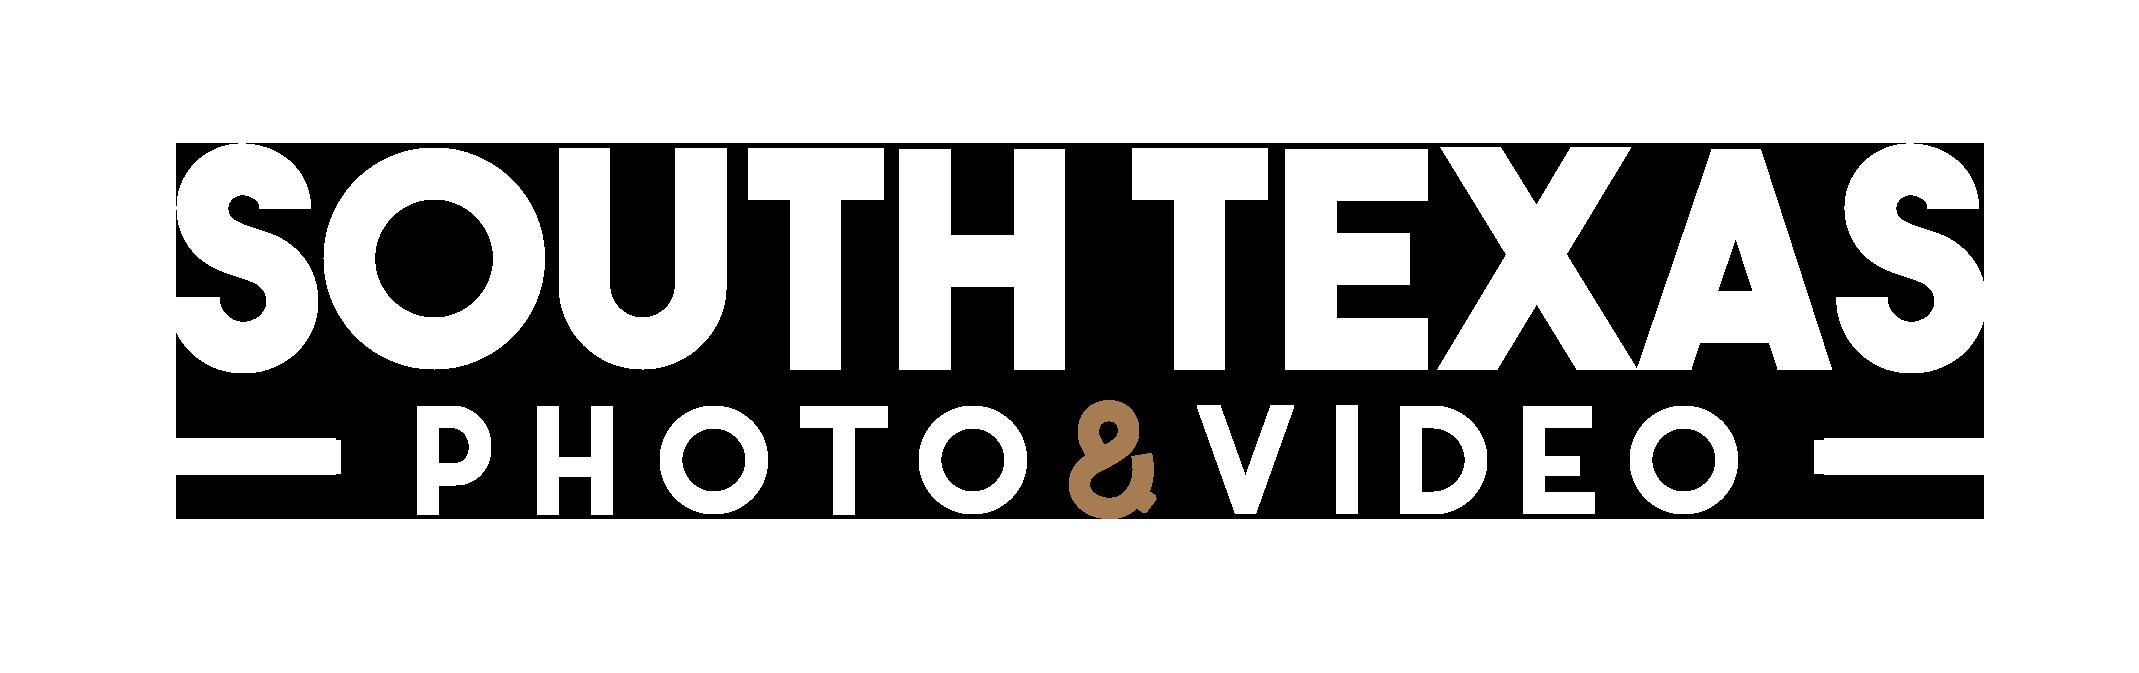 South Texas Photo & Video